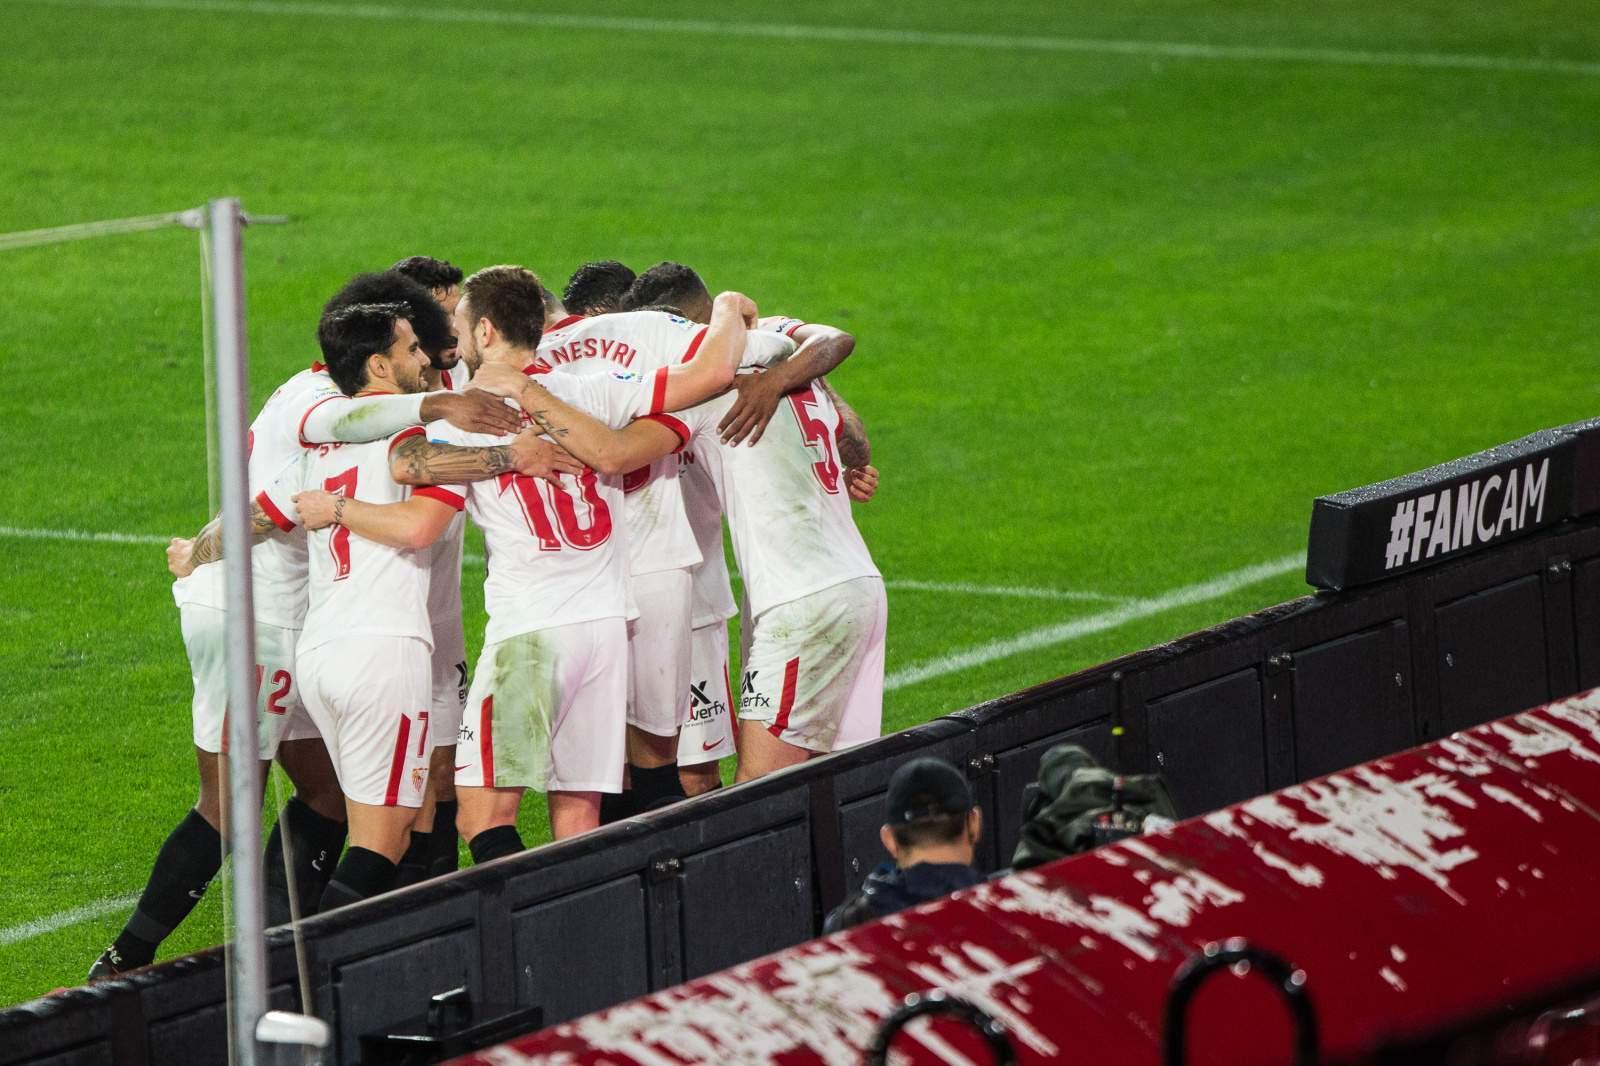 «Эльче» - «Севилья»: прогноз на матч чемпионата Испании - 28 августа 2021